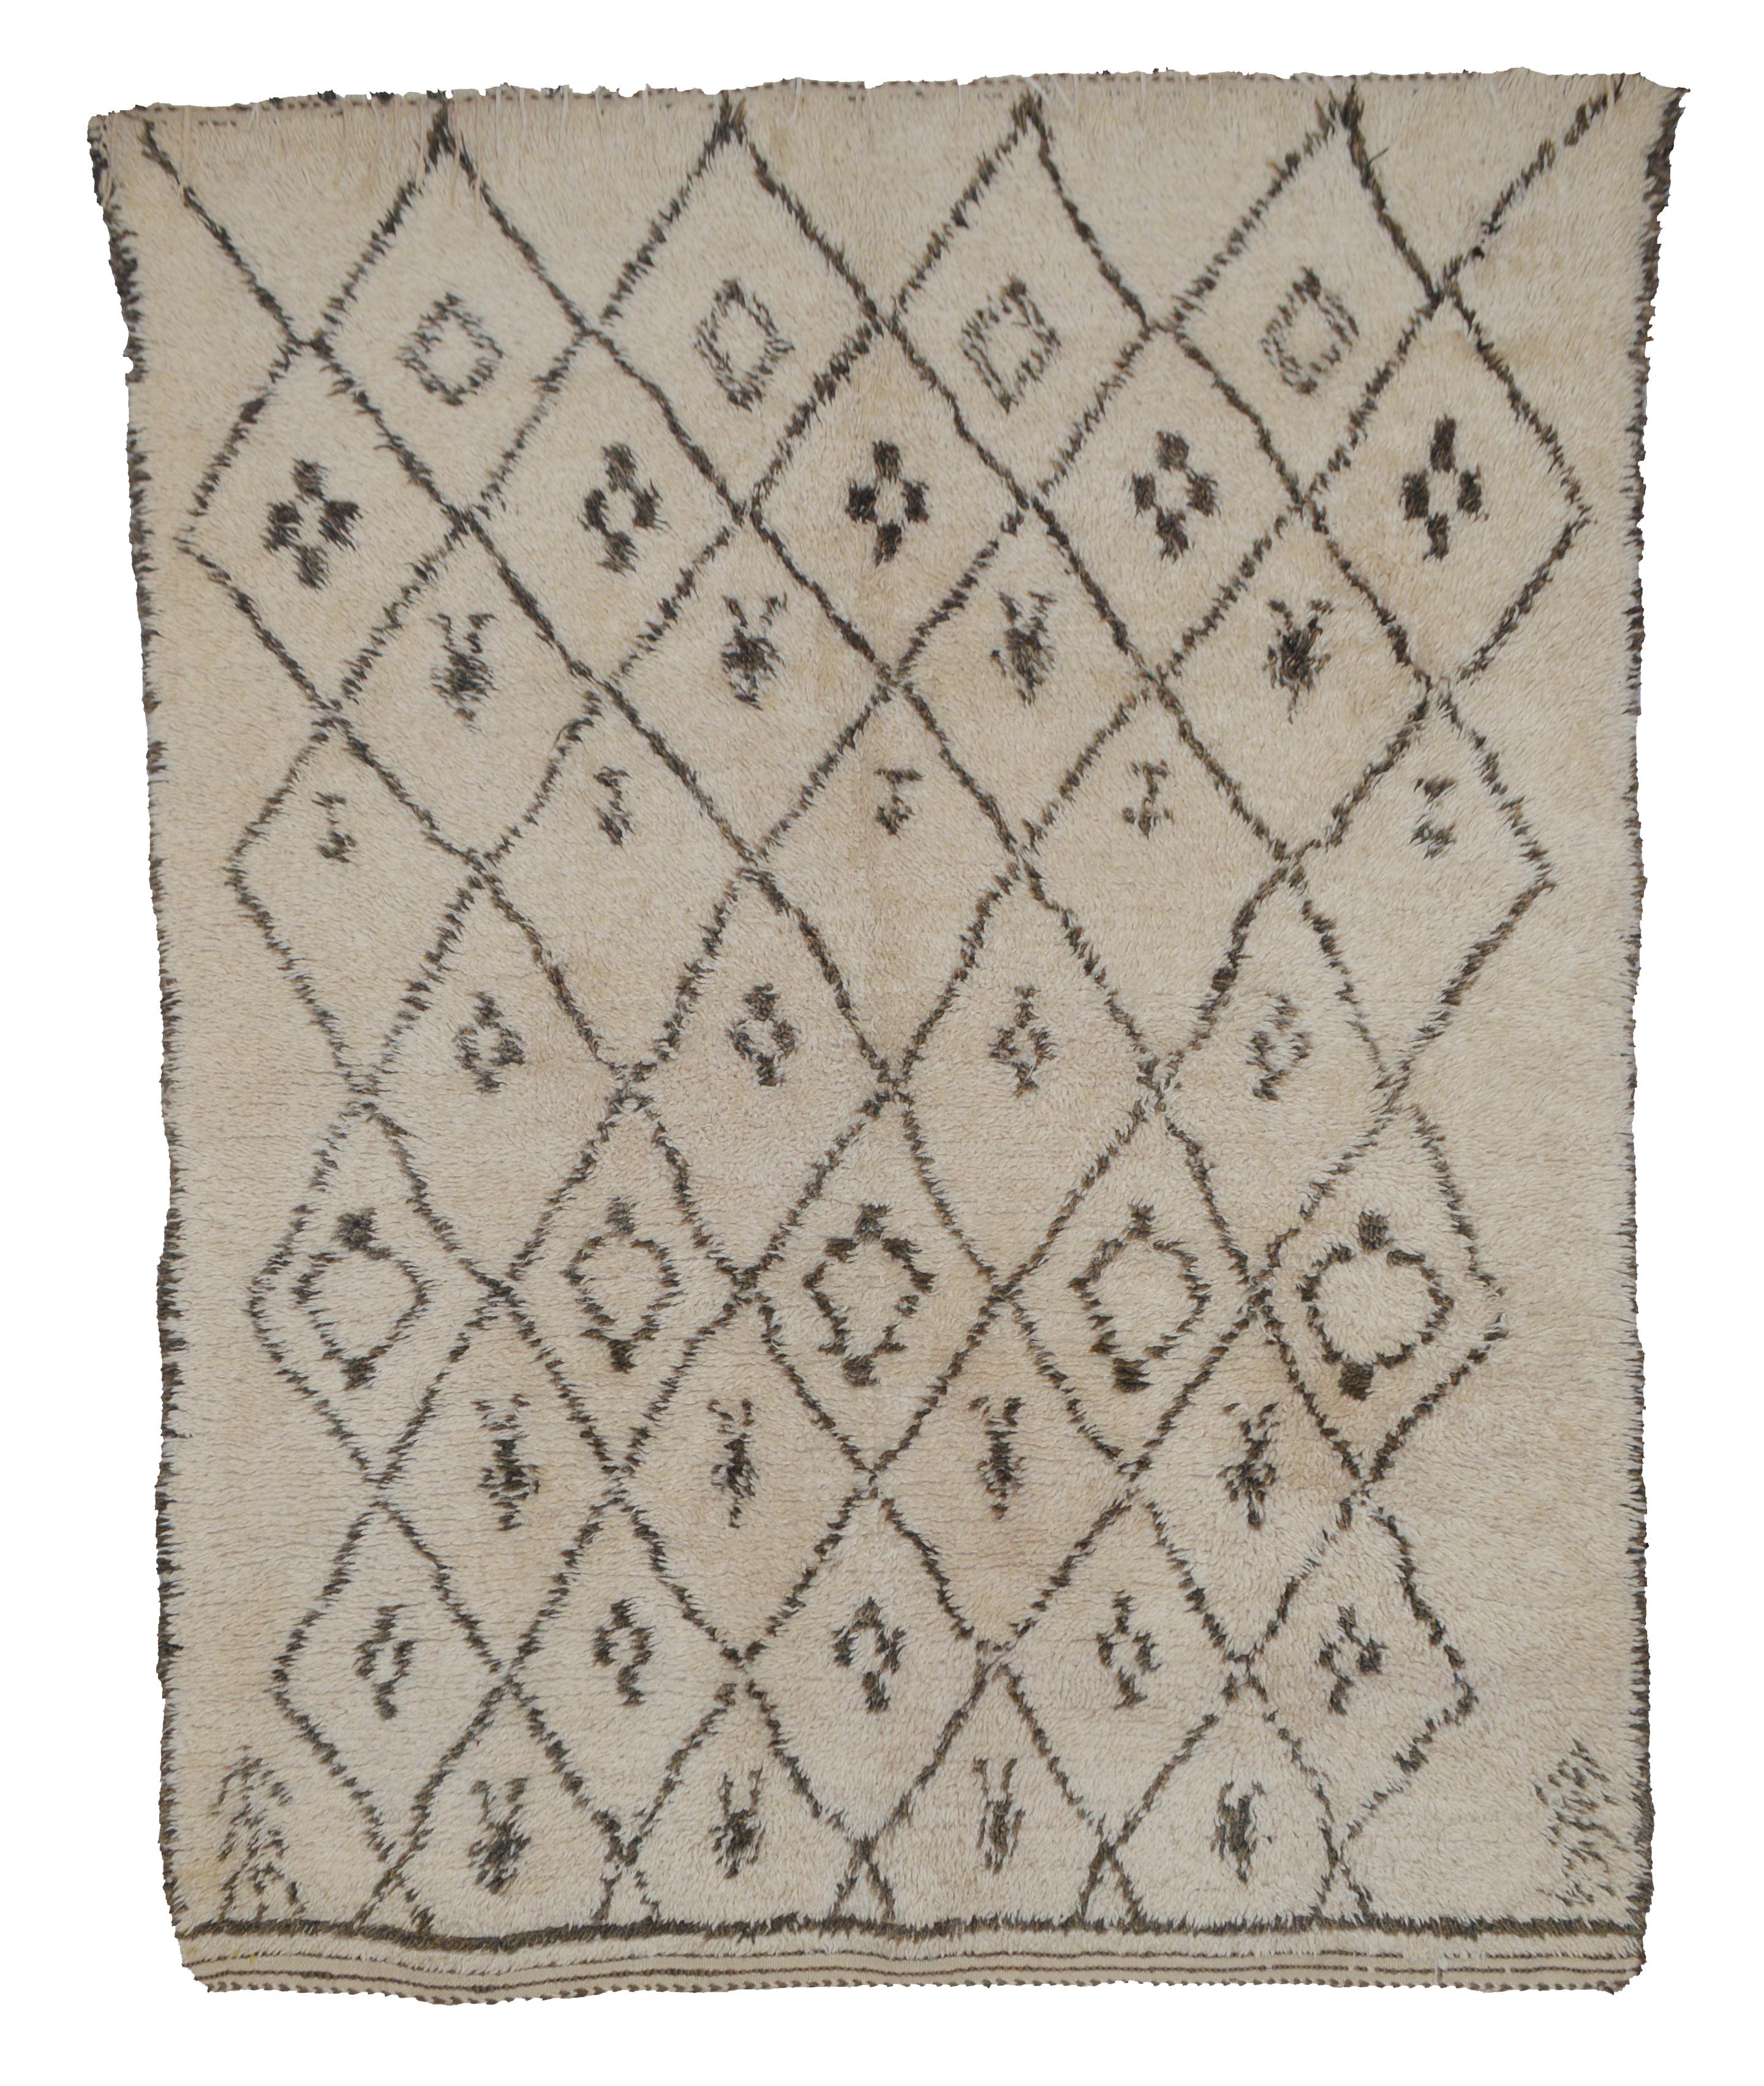 Beni Ourain BN01 - 230 x 180 cm